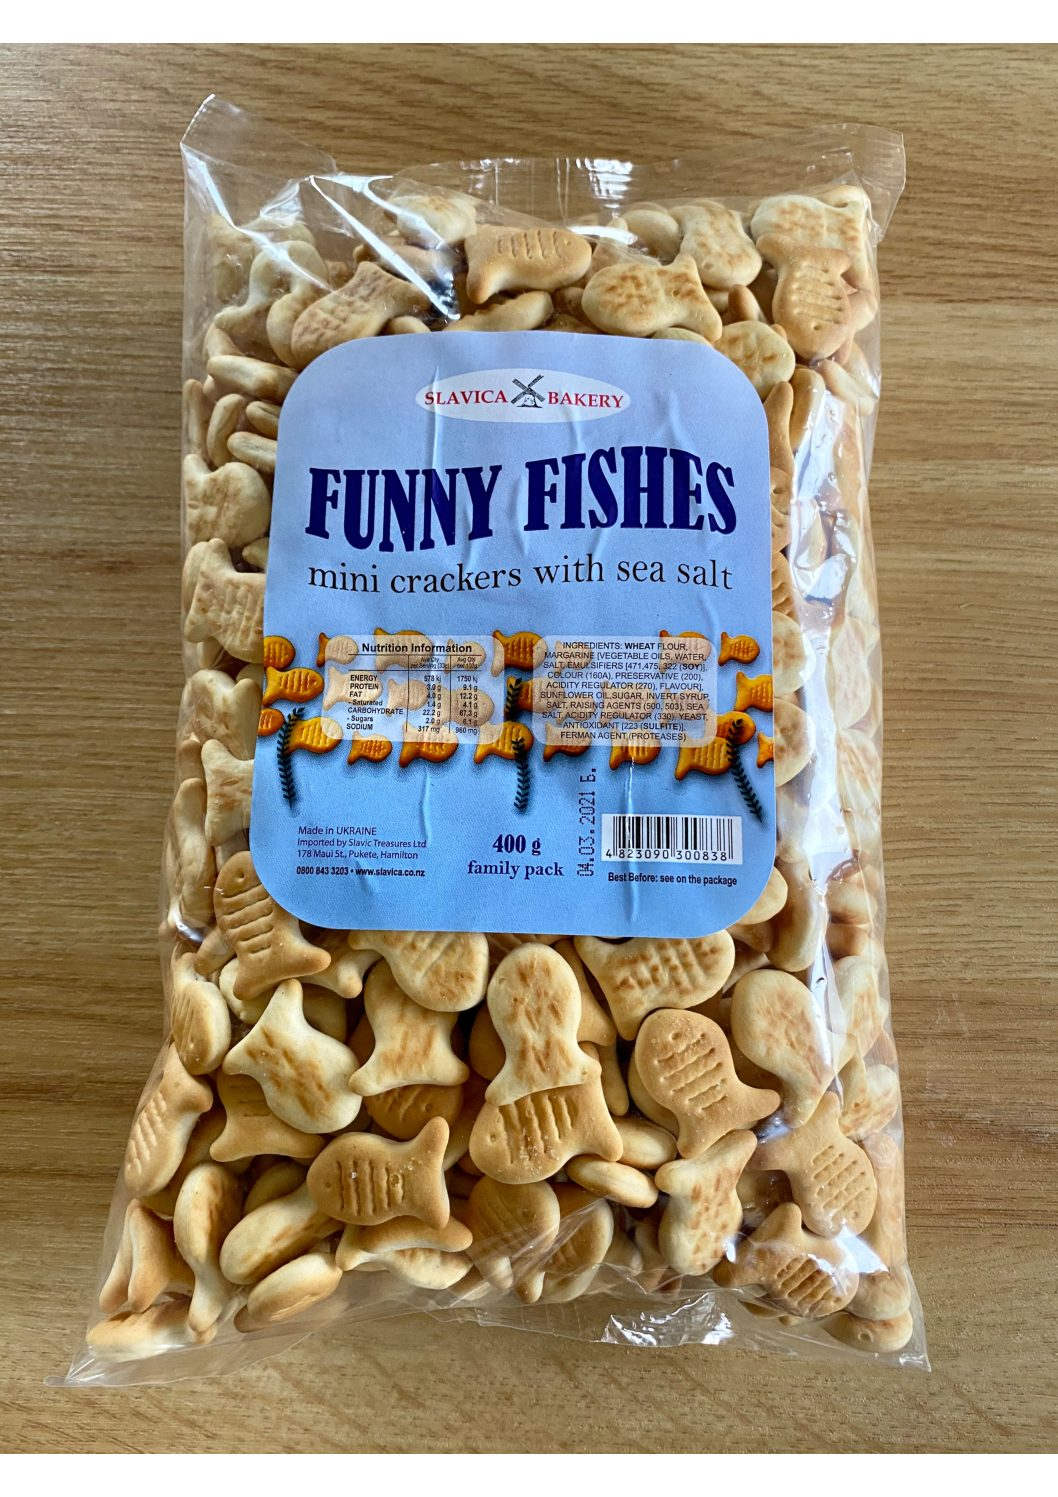 Slavica Bakery Funny Fishes 400g